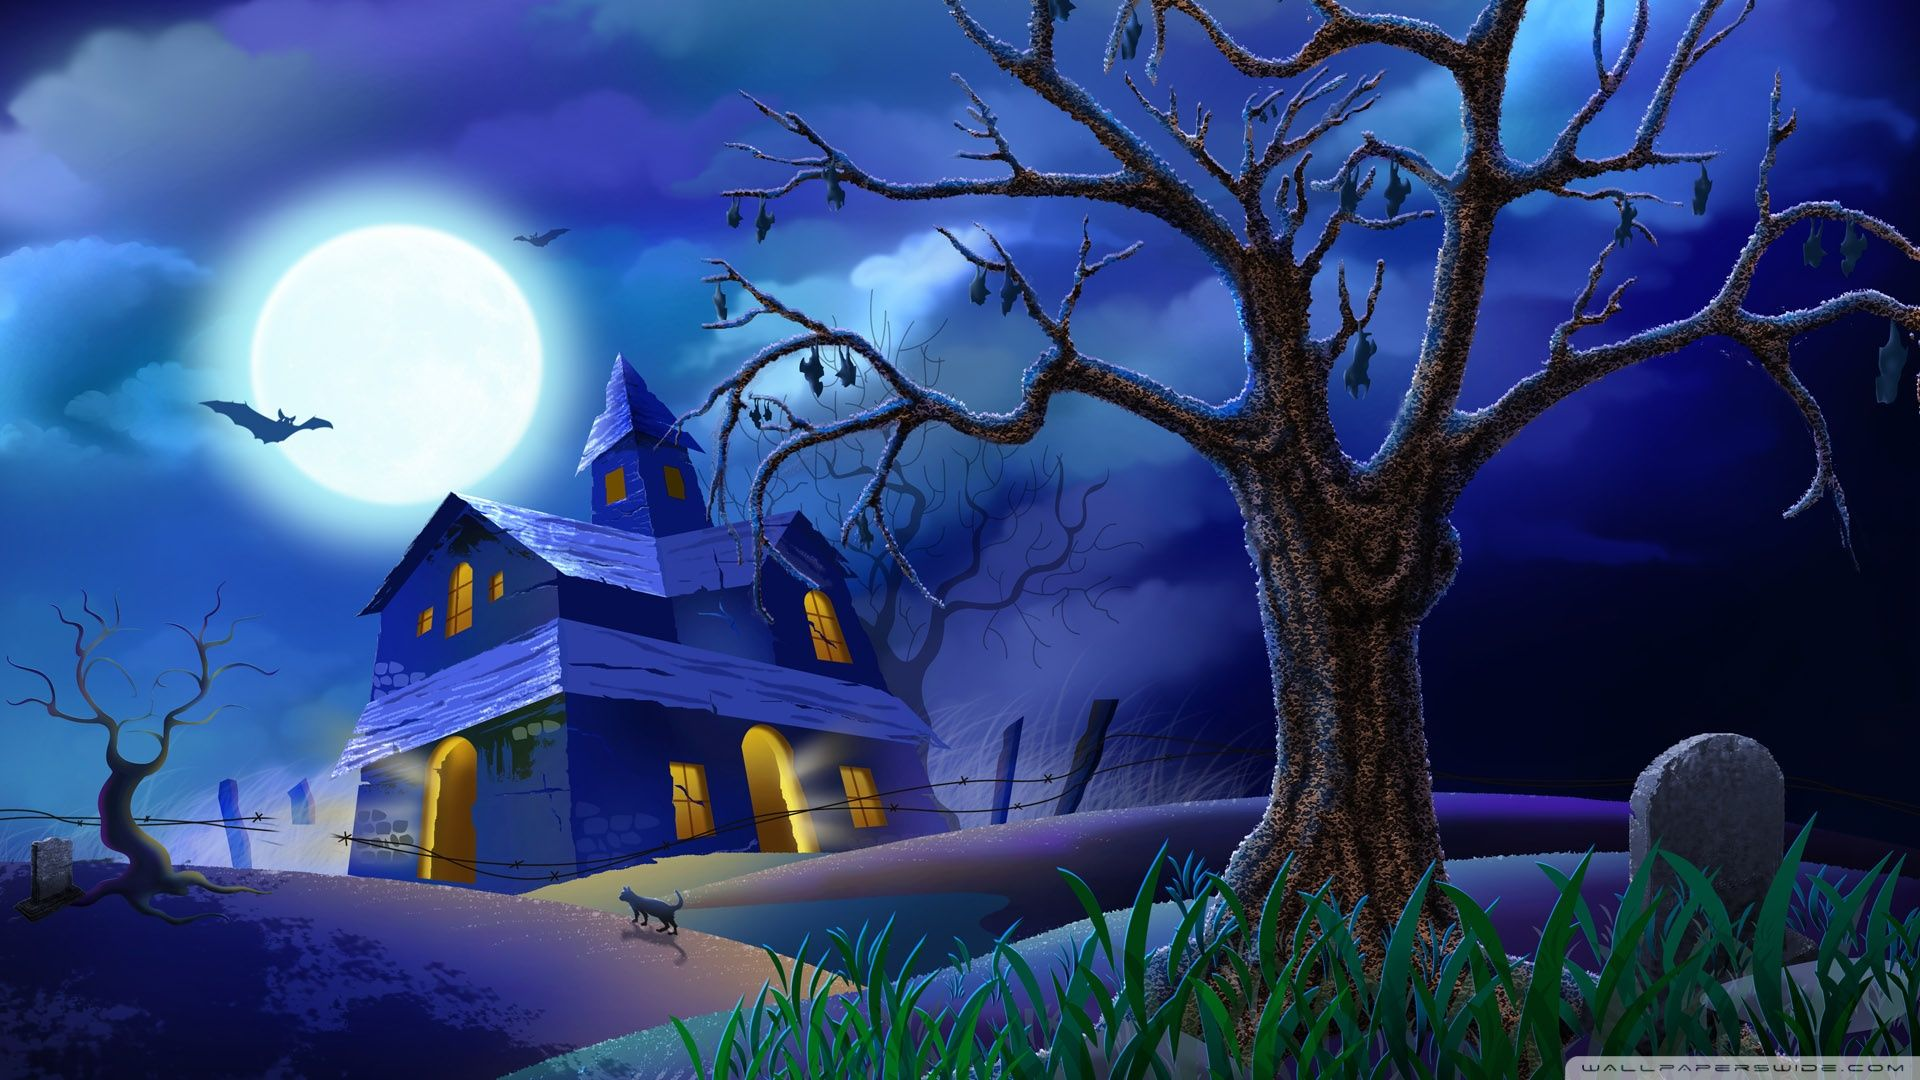 Witch On Broom Full Moon Hallowmas Halloween HD desktop